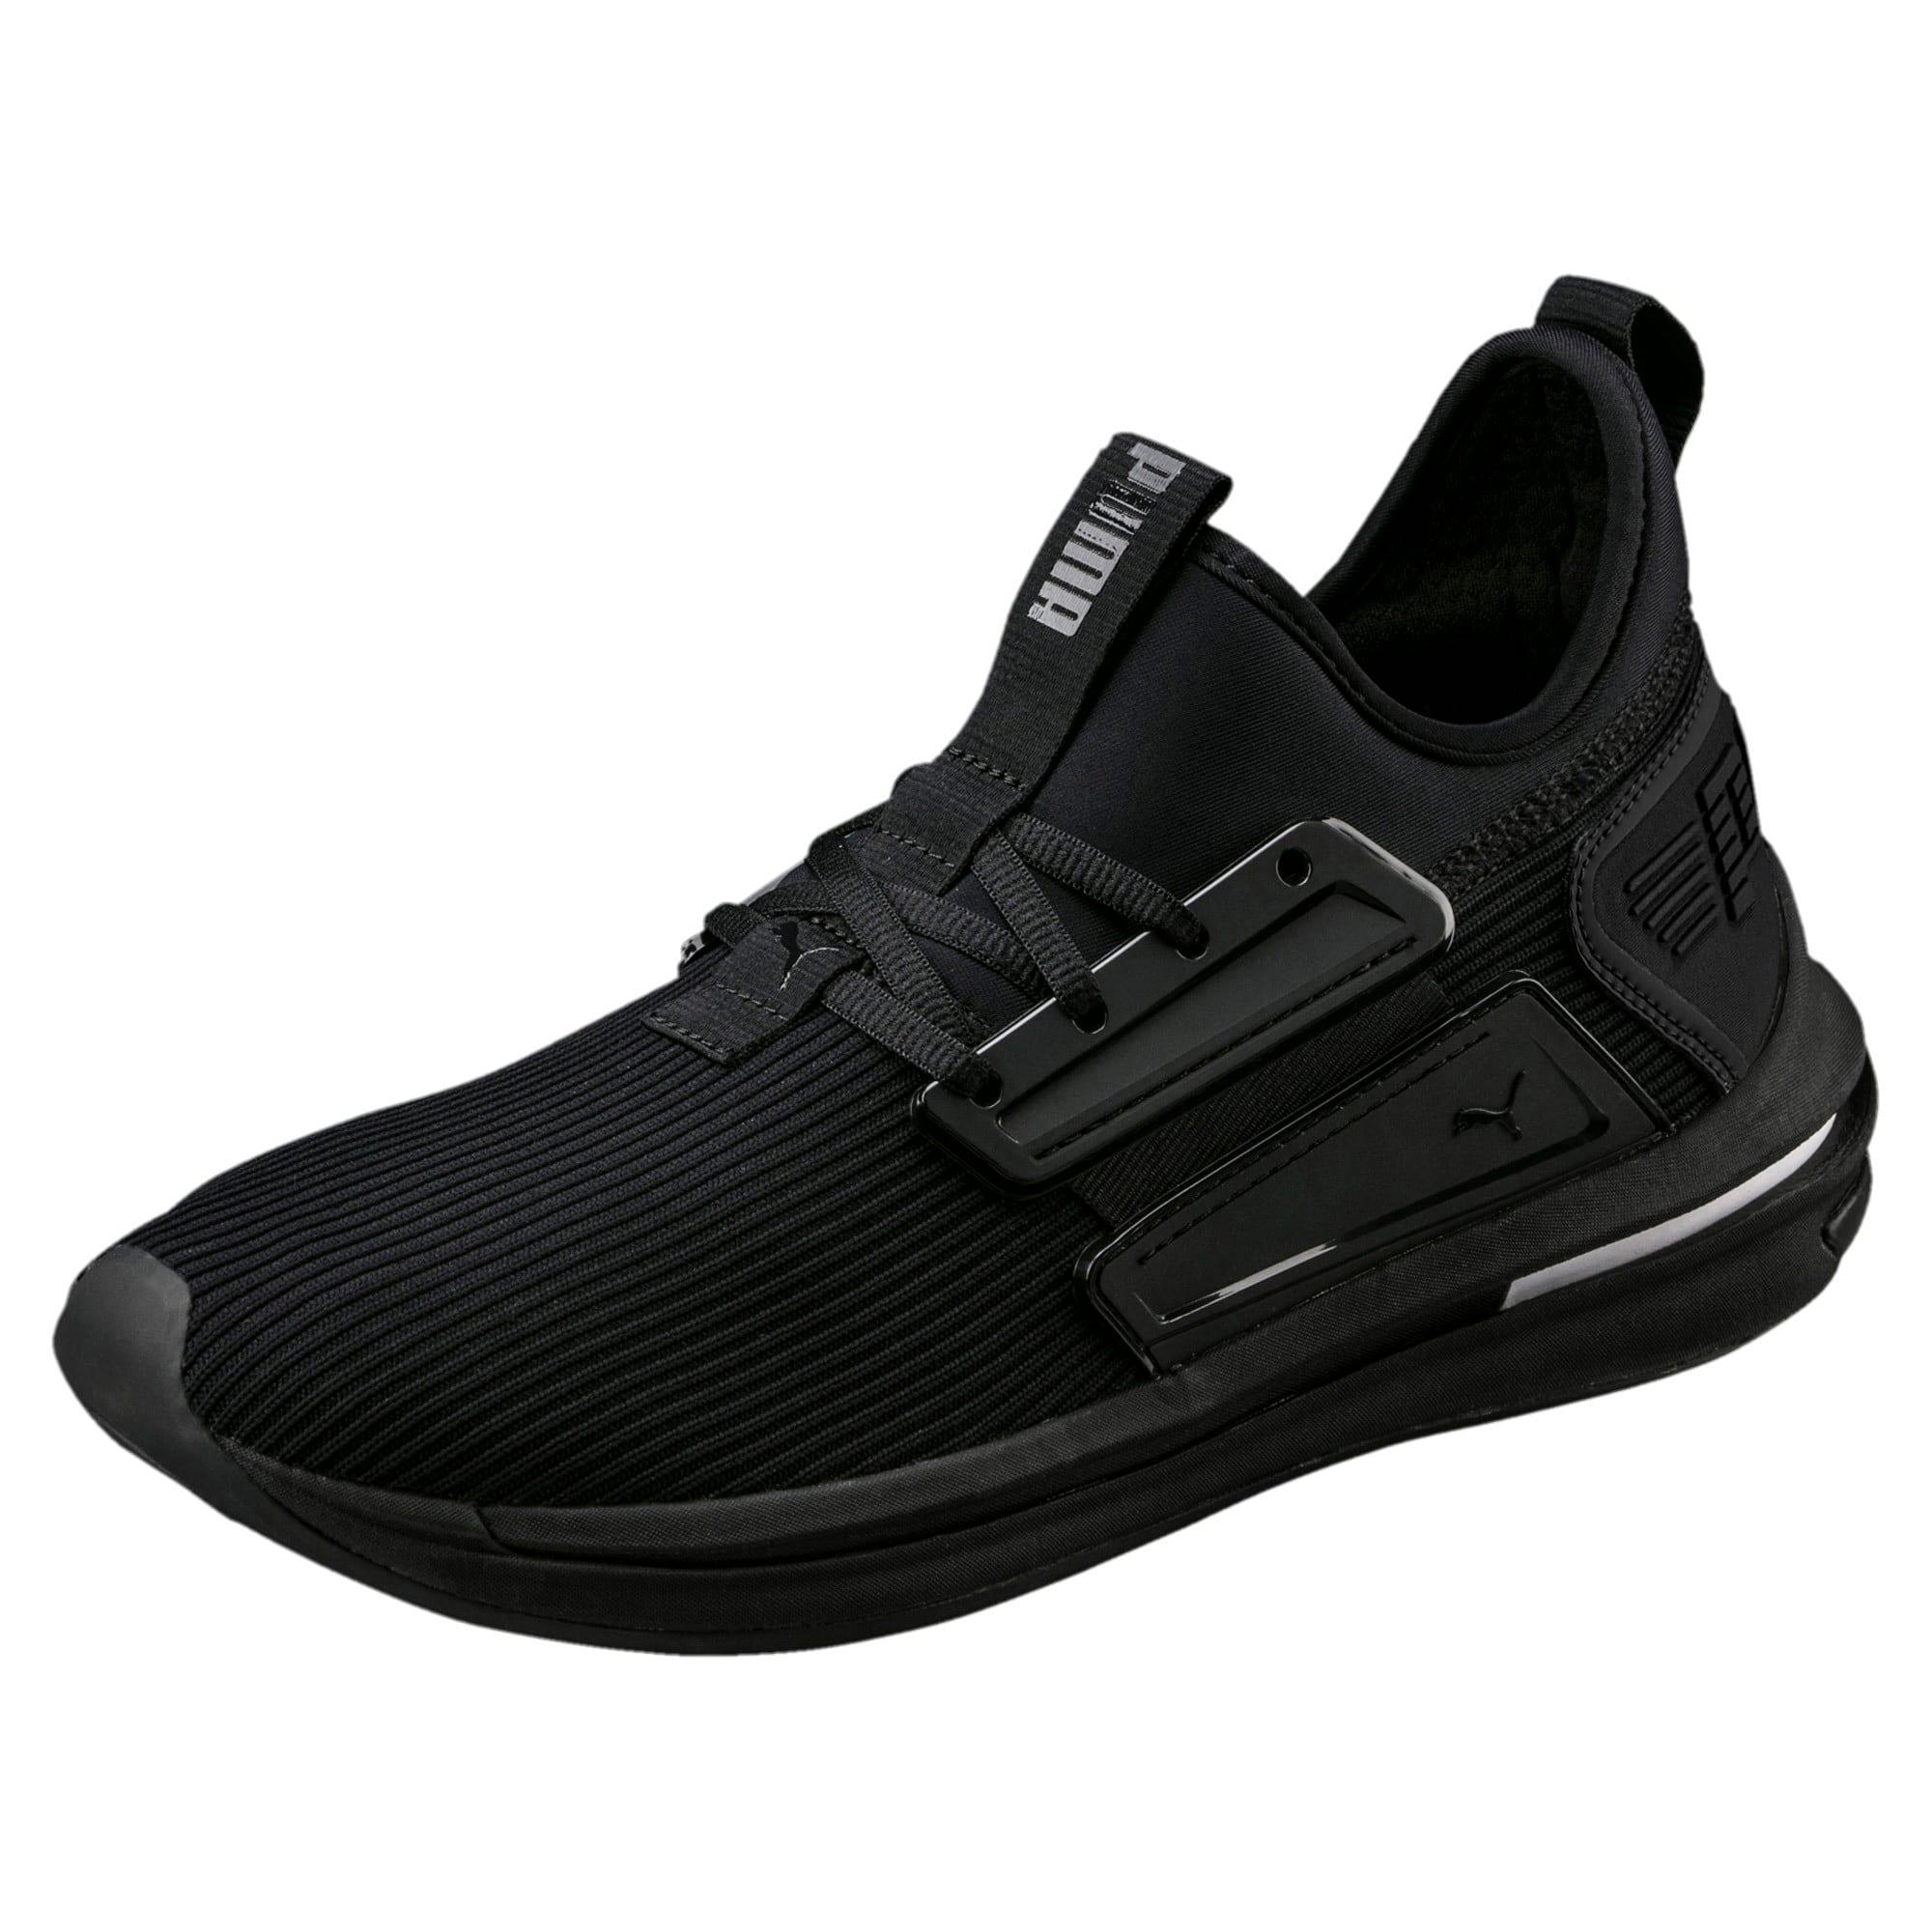 Thumbnail 1 of IGNITE Limitless SR Men's Running Shoes, Puma Black, medium-IND